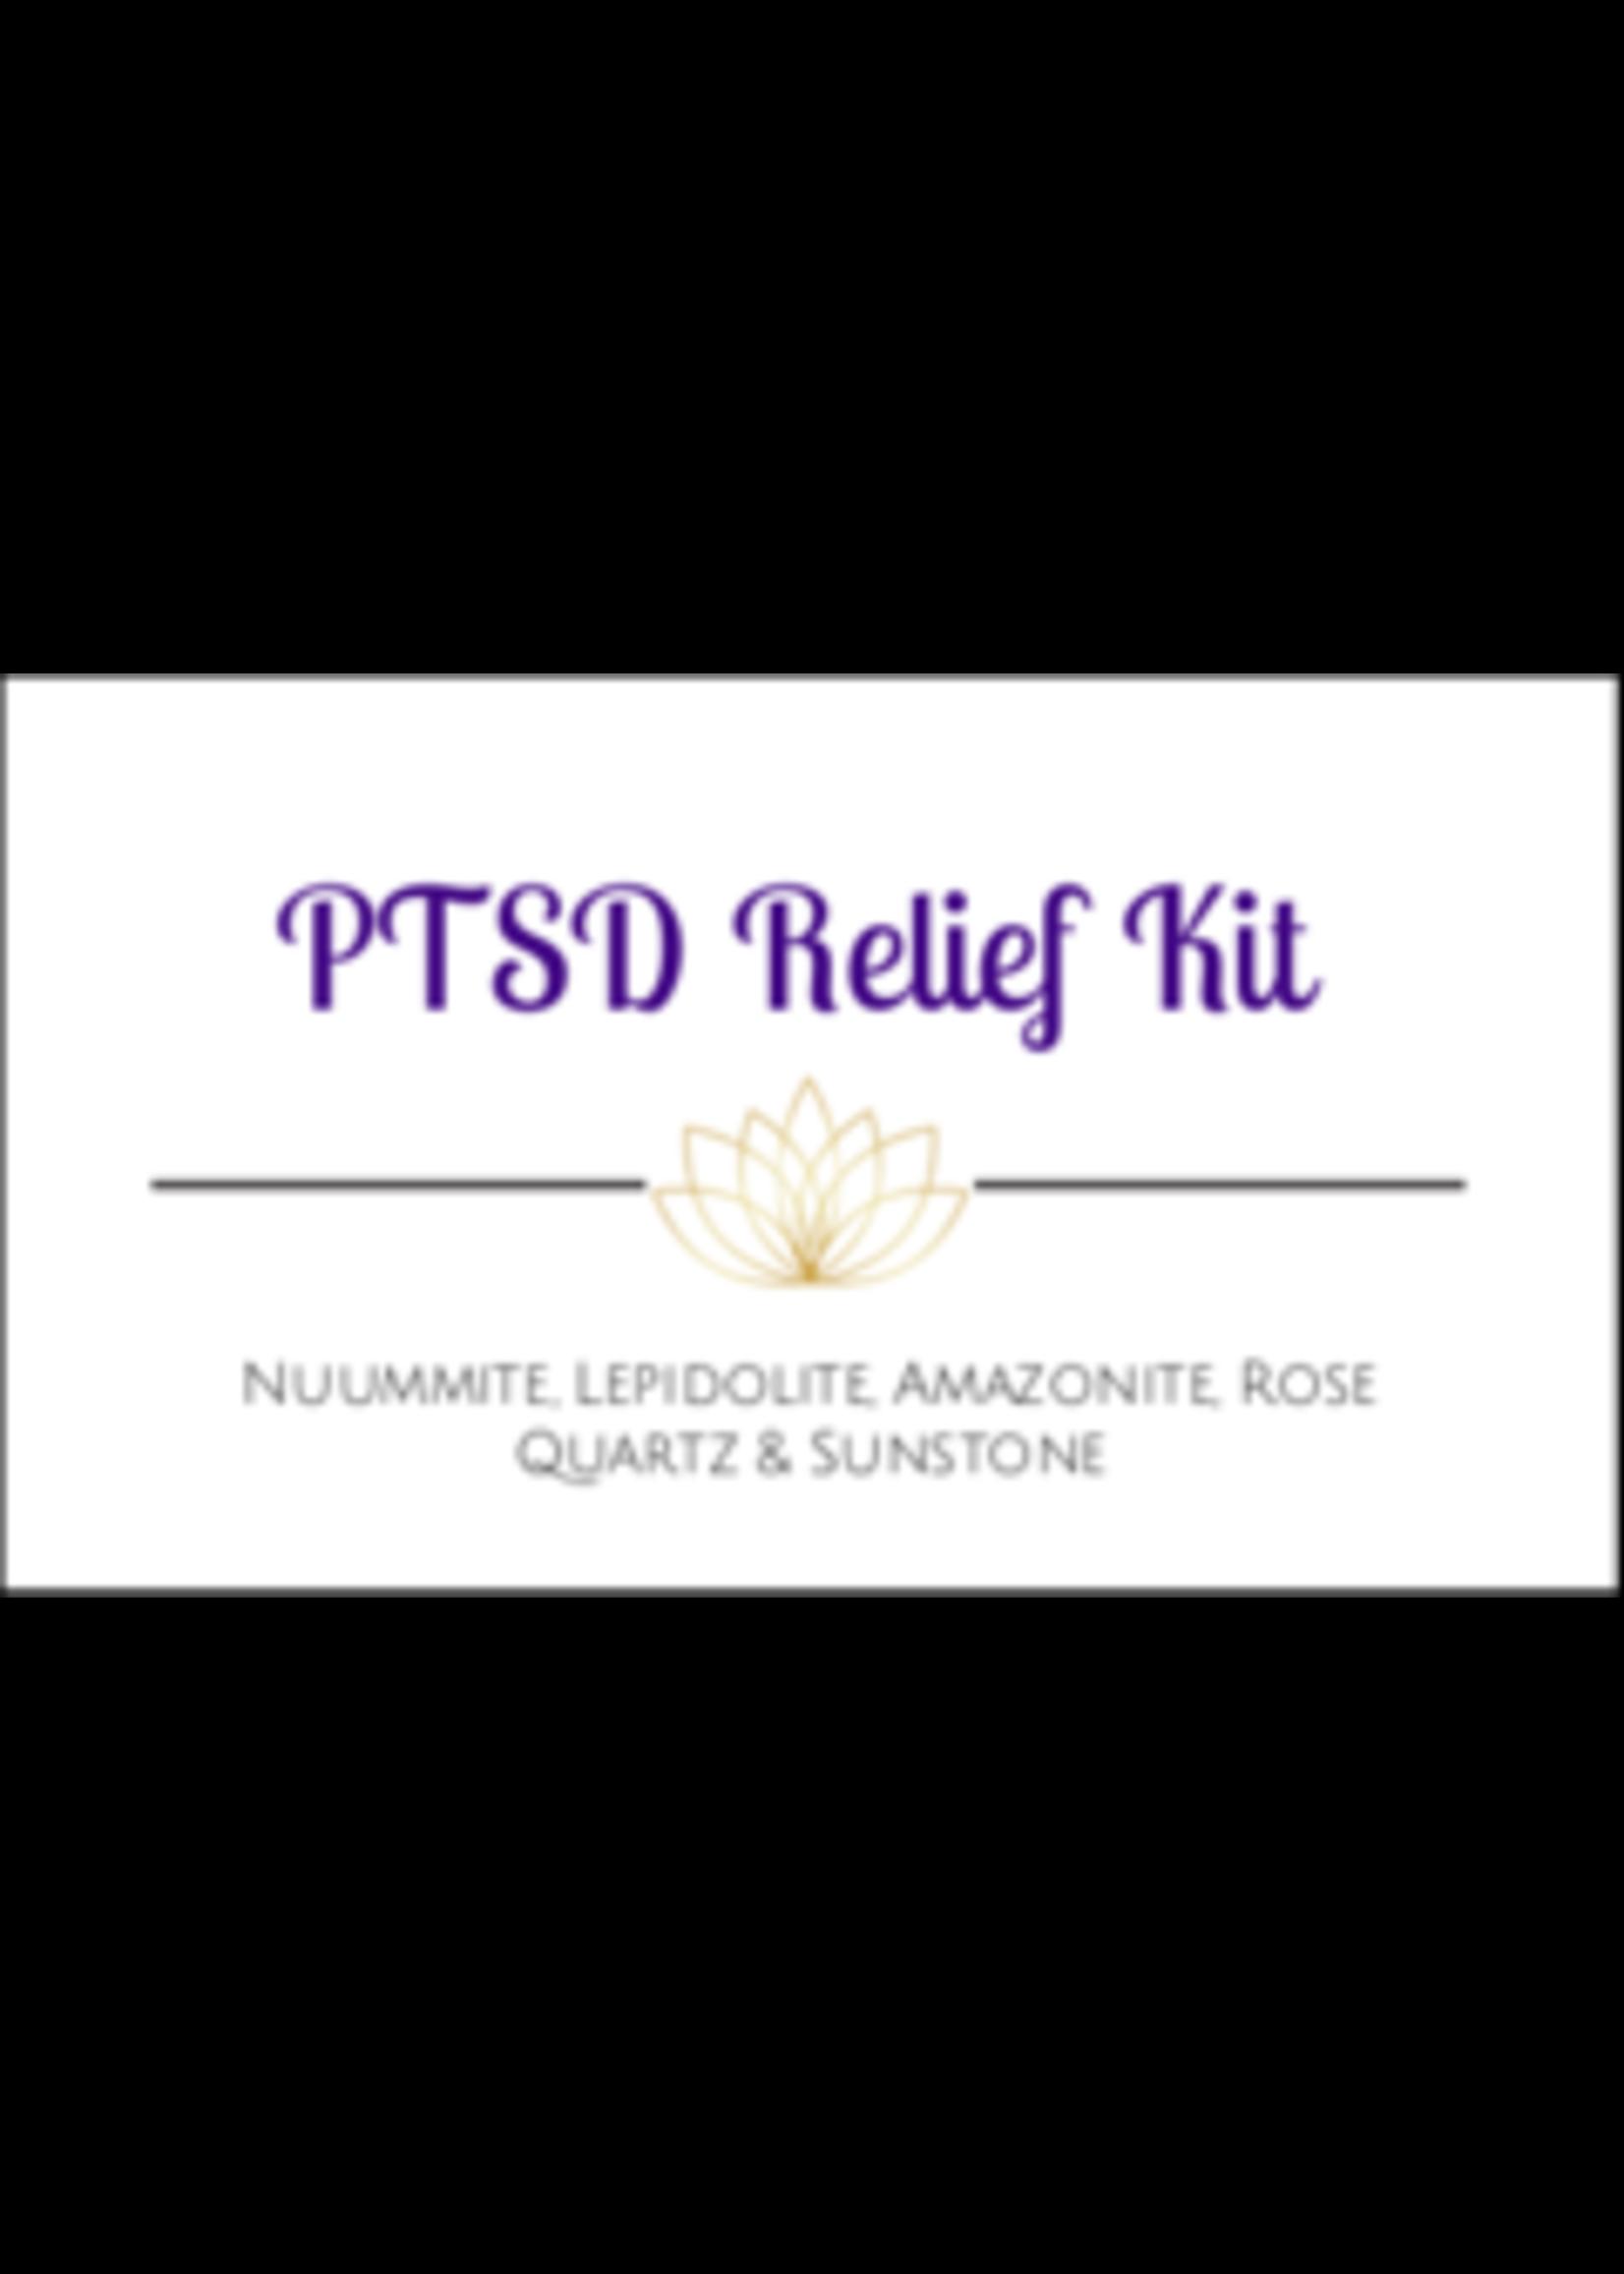 PTSD Crystal Kit Cards - Box of 100